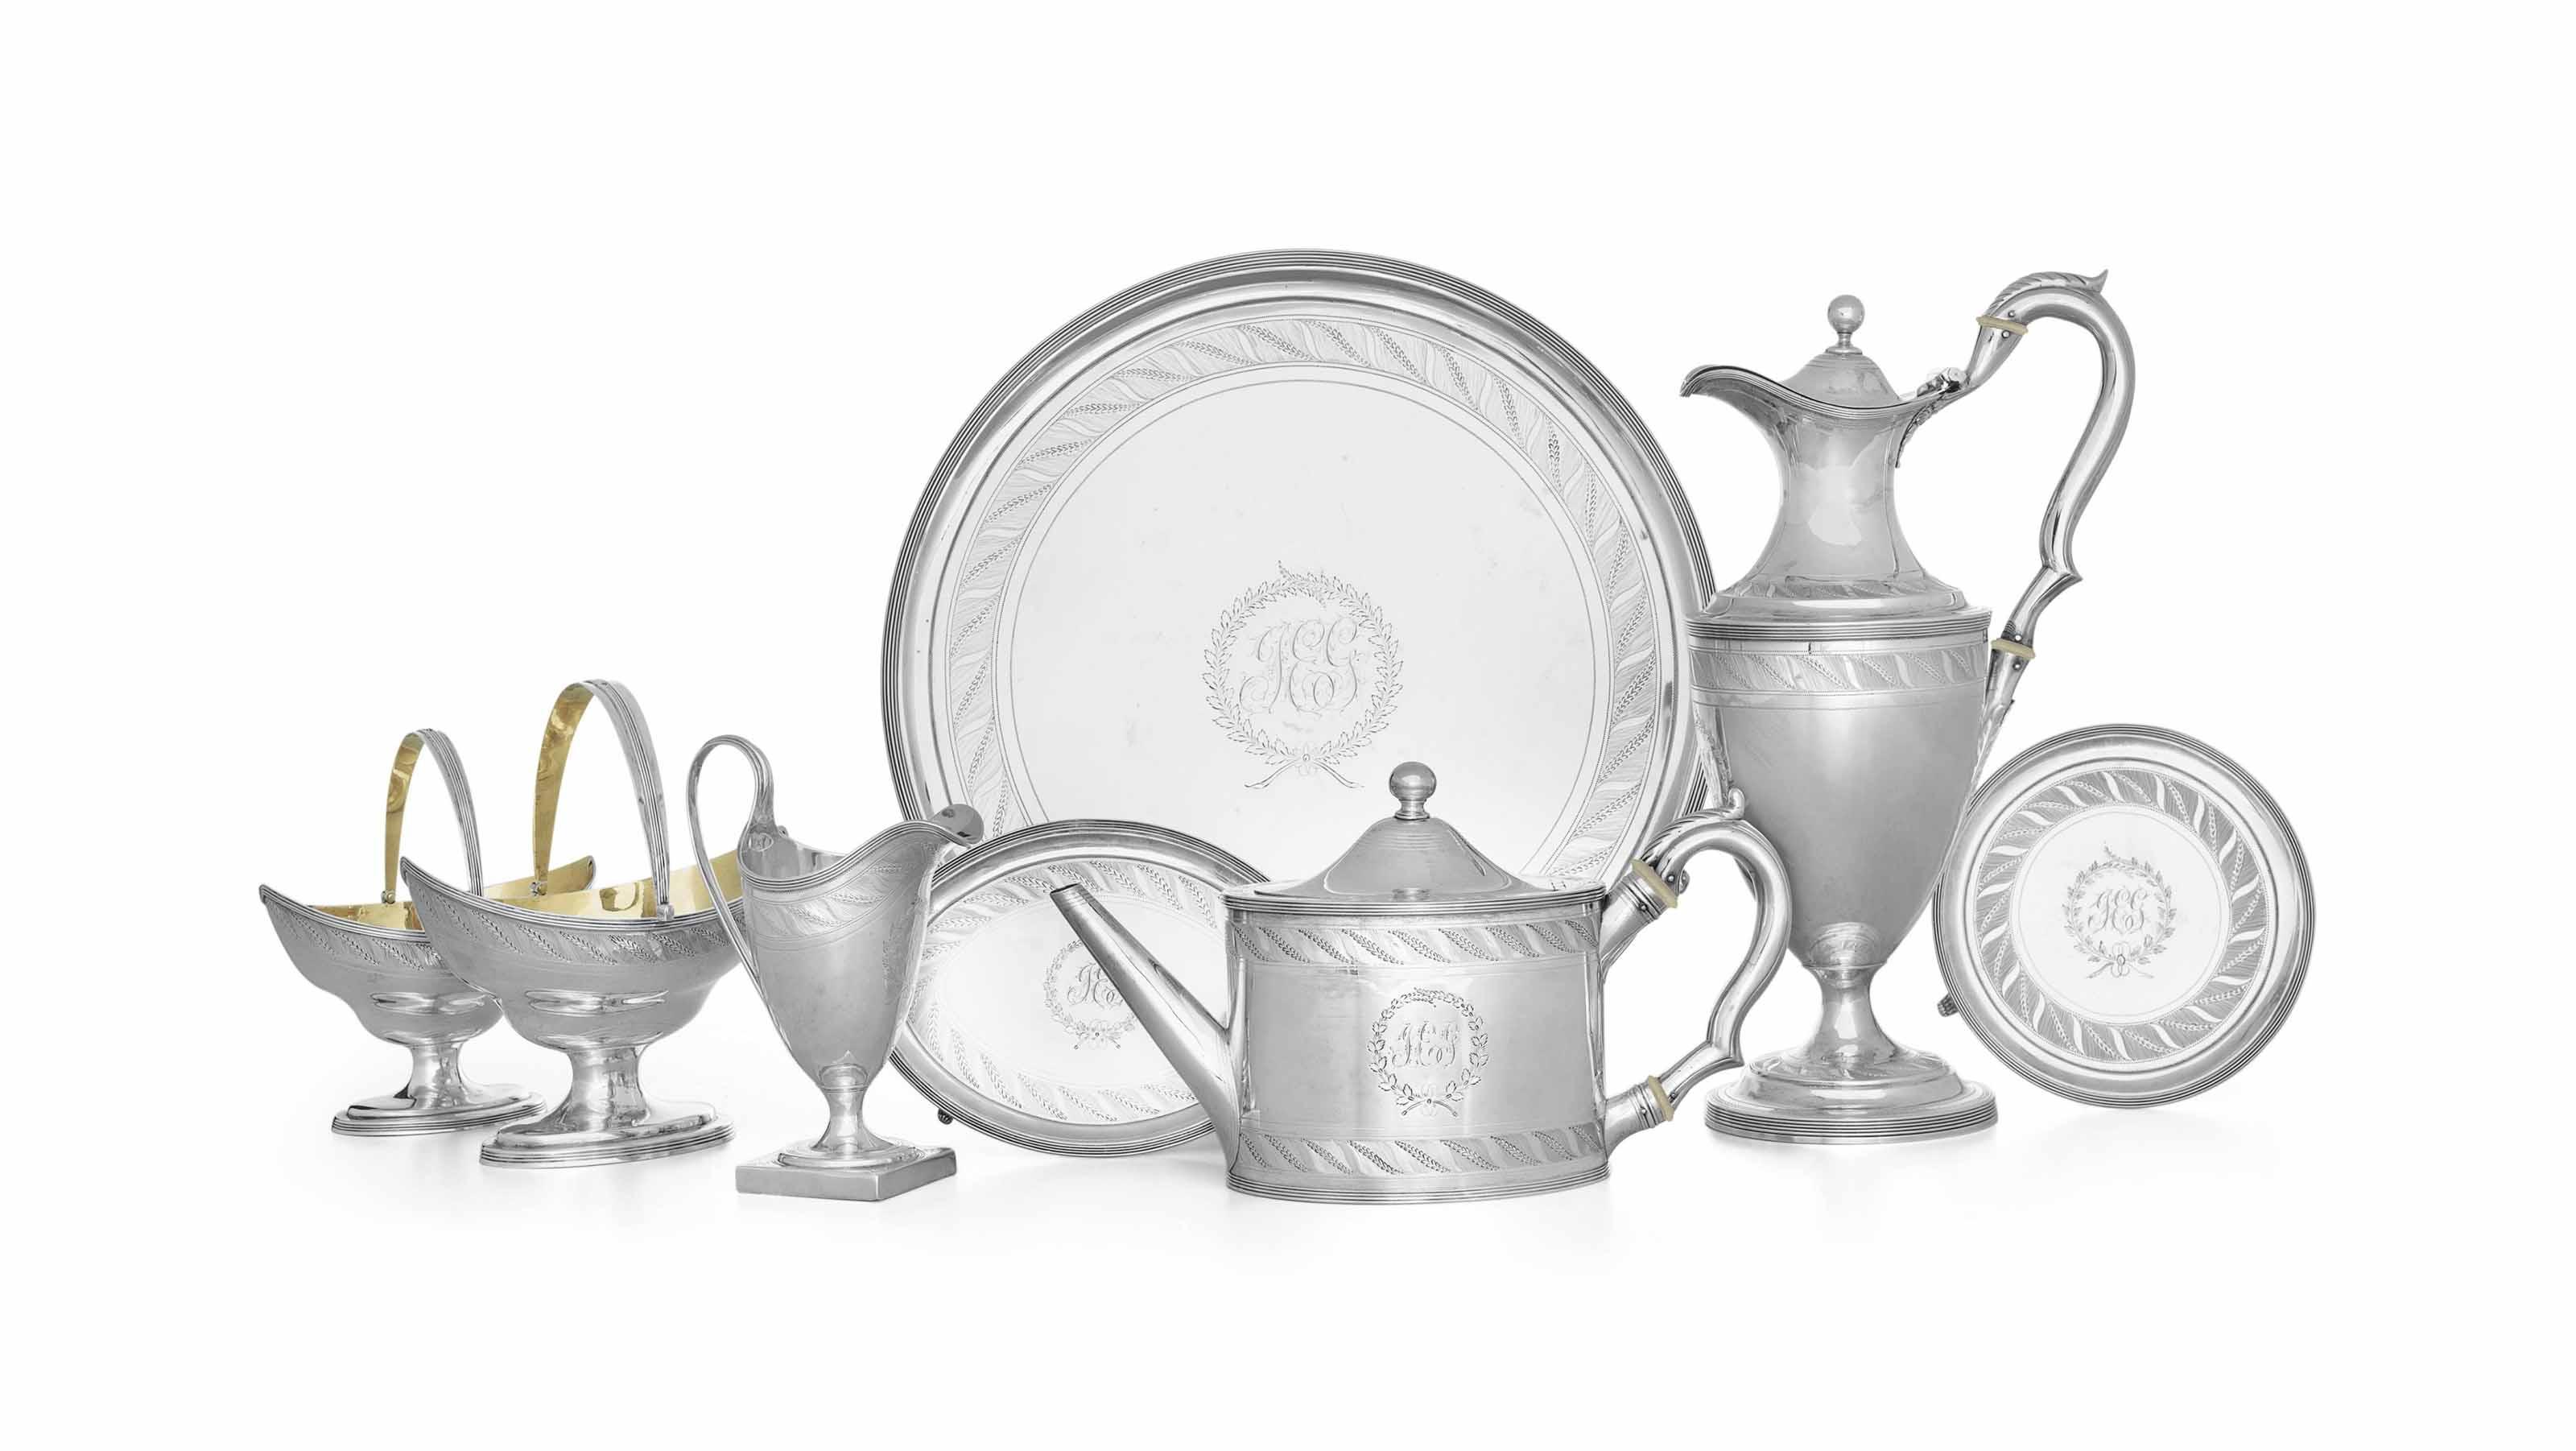 A GEORGE III SILVER TEA AND COFFEE SERVICE